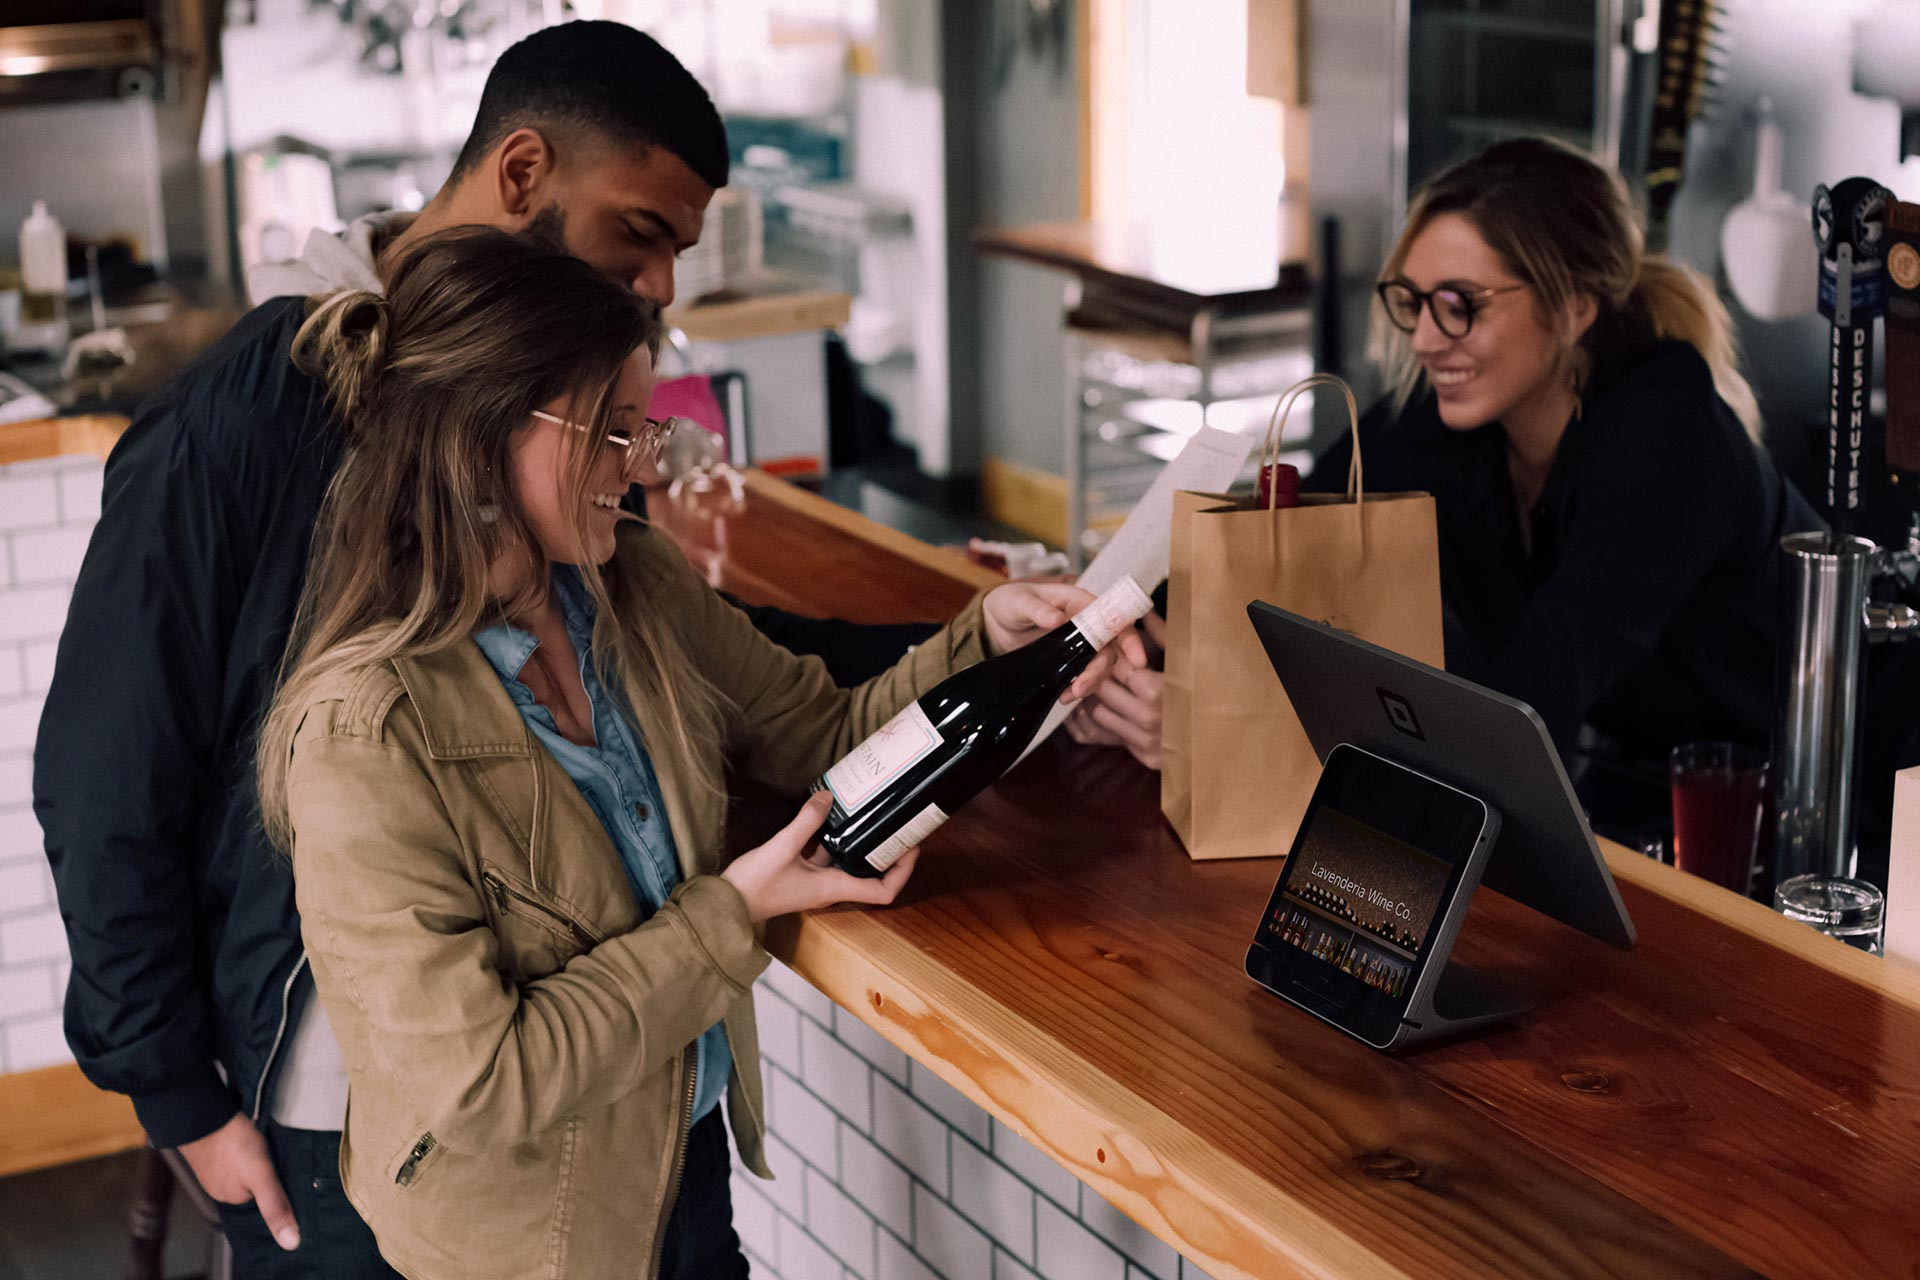 couple purchasing wine